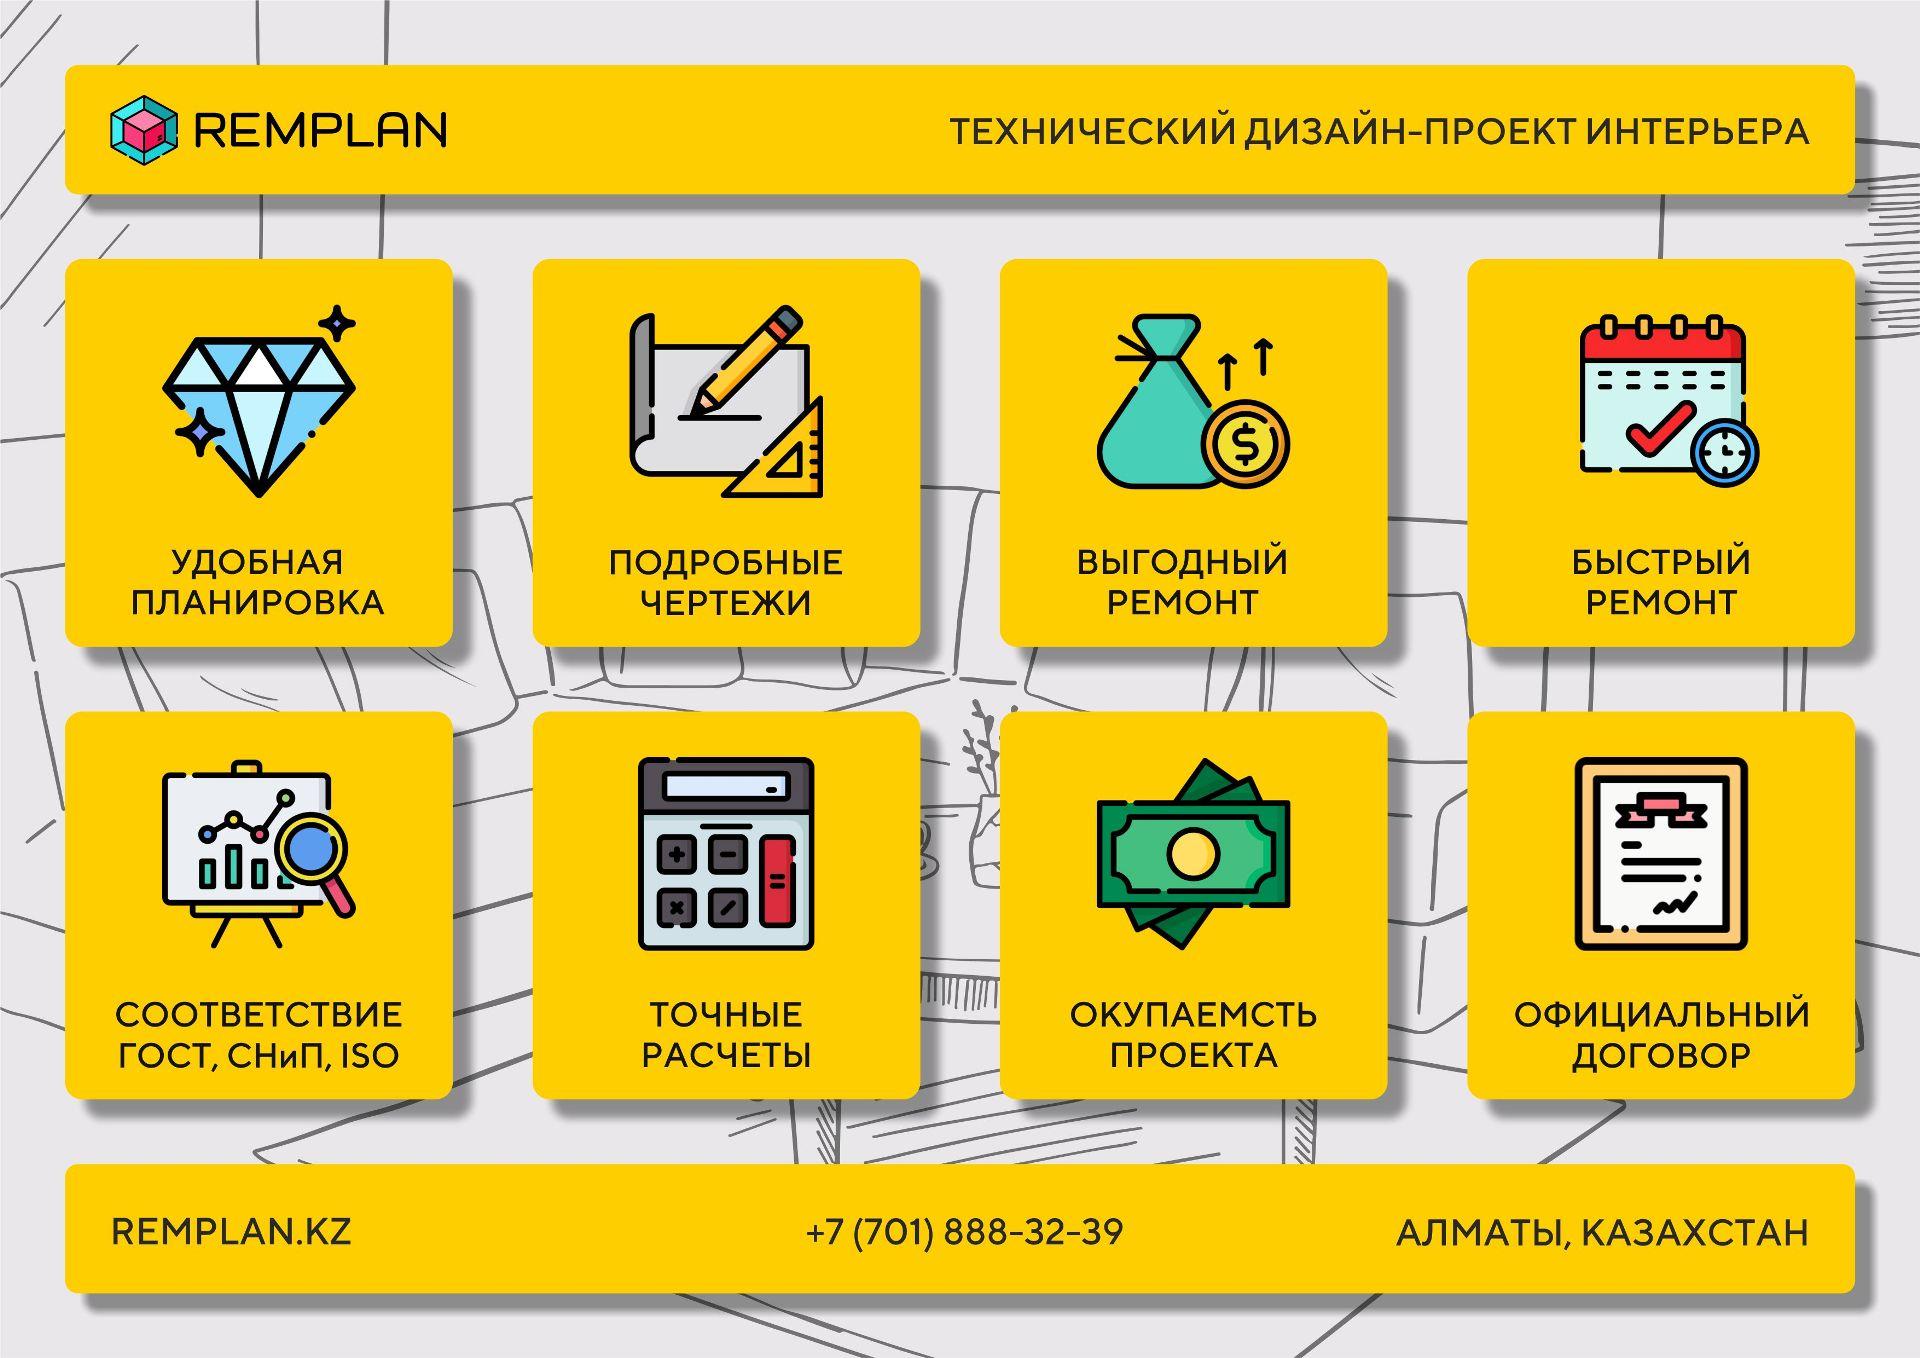 Технический дизайн интерьера Алматы. Технический проект ремонта Алматы. Дизайн интерьера Алматы.